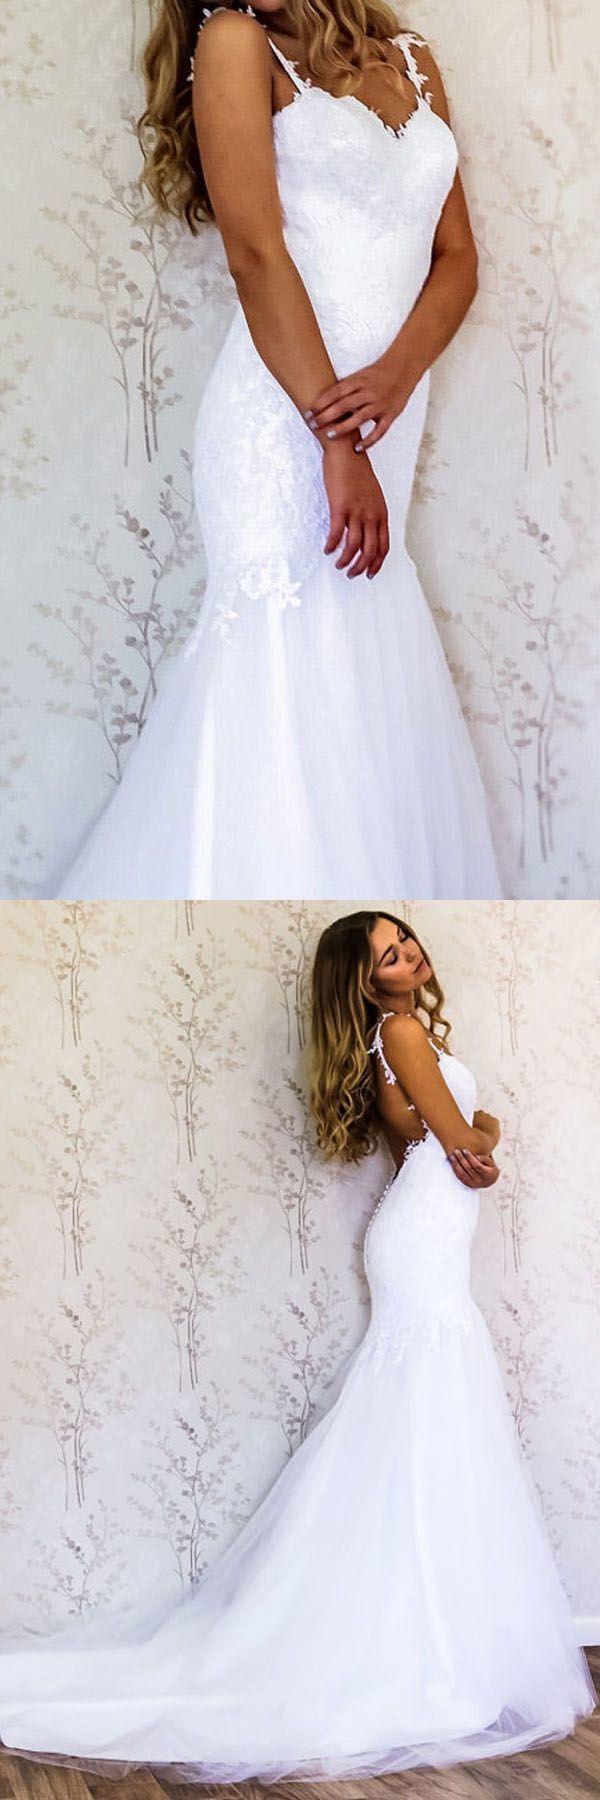 Elegant Straps Mermaid White Long Wedding Dress Bridal Gown